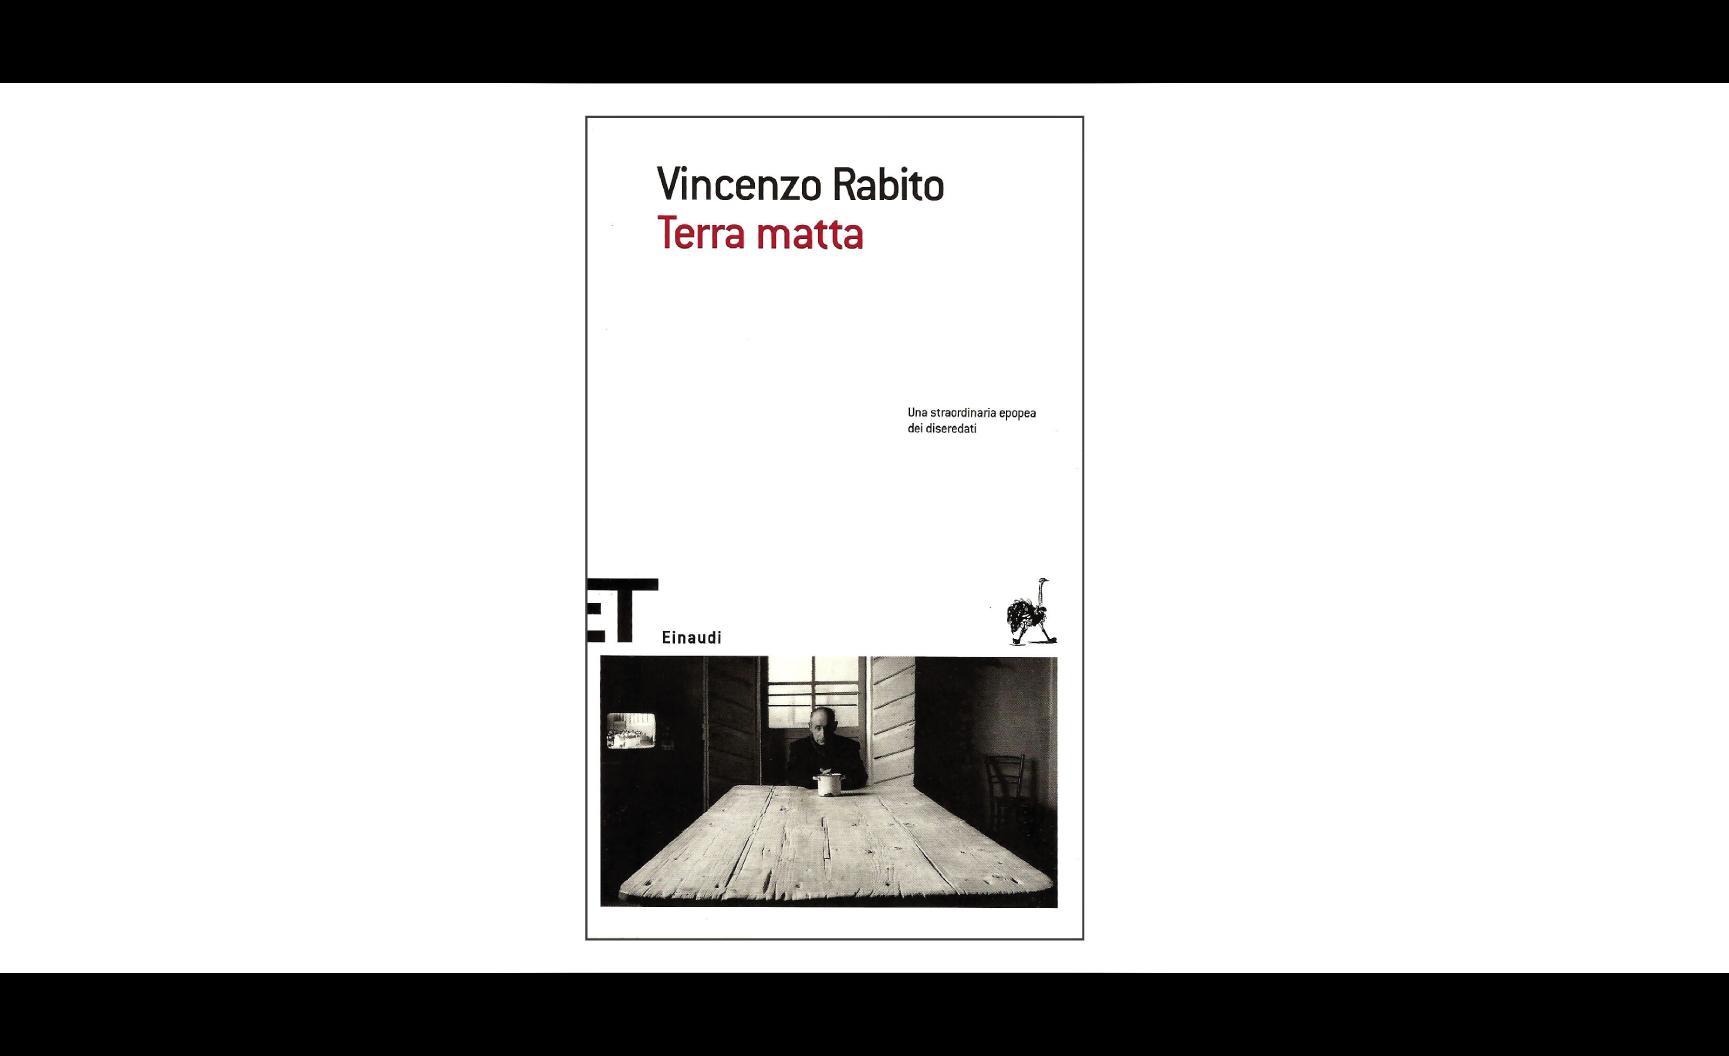 Vincenzo Rabito Terra Matta